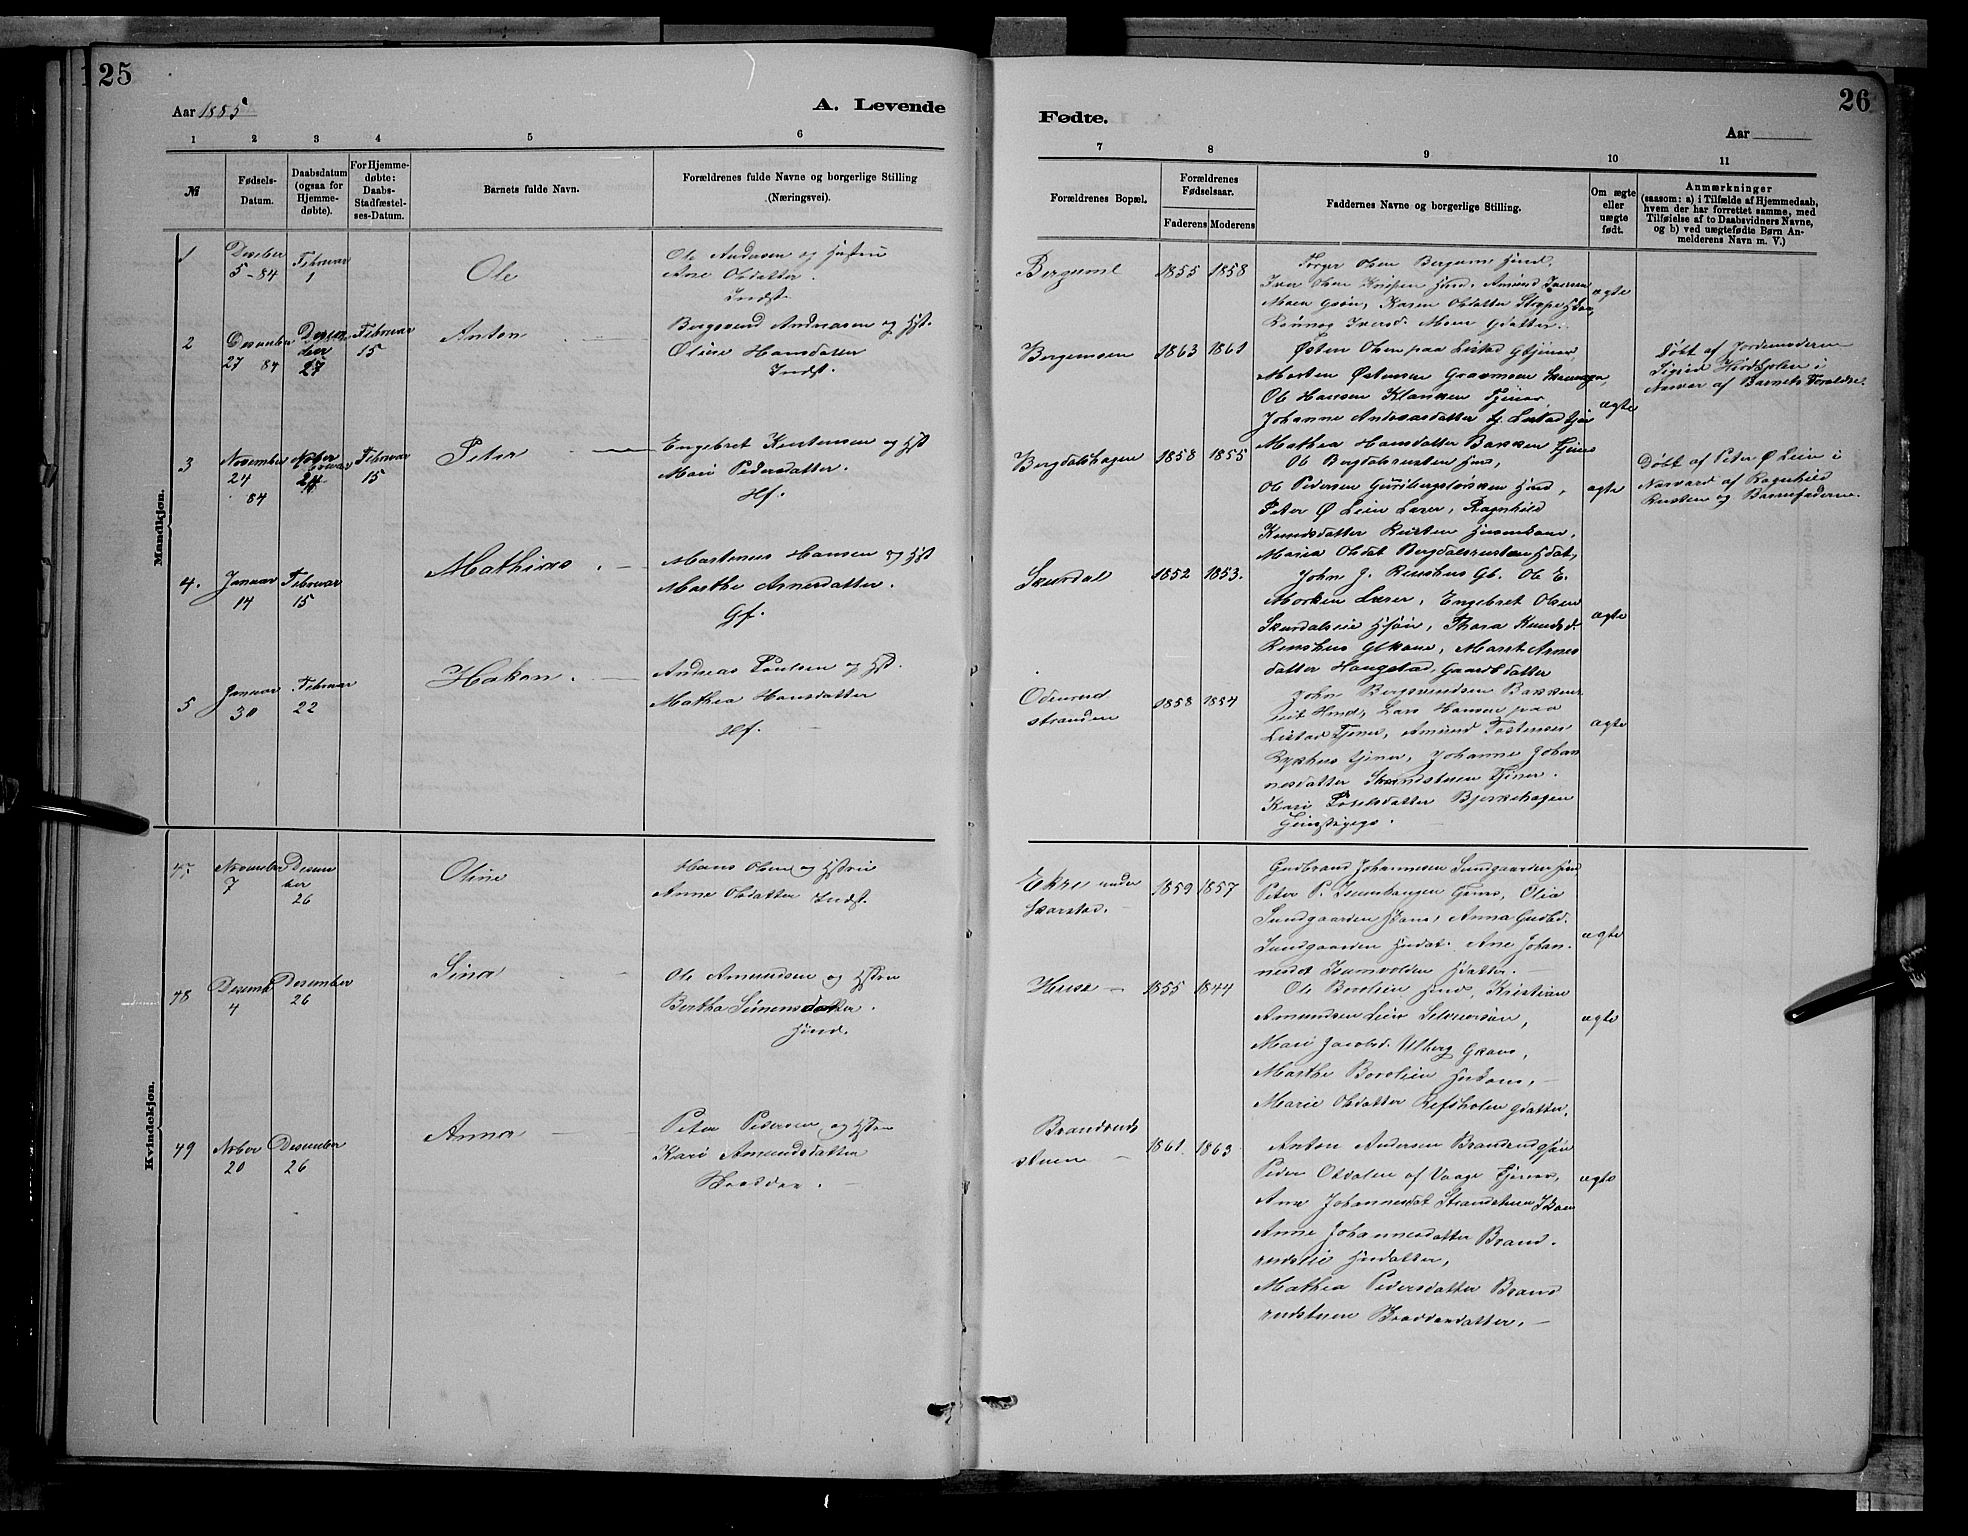 SAH, Sør-Fron prestekontor, H/Ha/Hab/L0003: Klokkerbok nr. 3, 1884-1896, s. 25-26